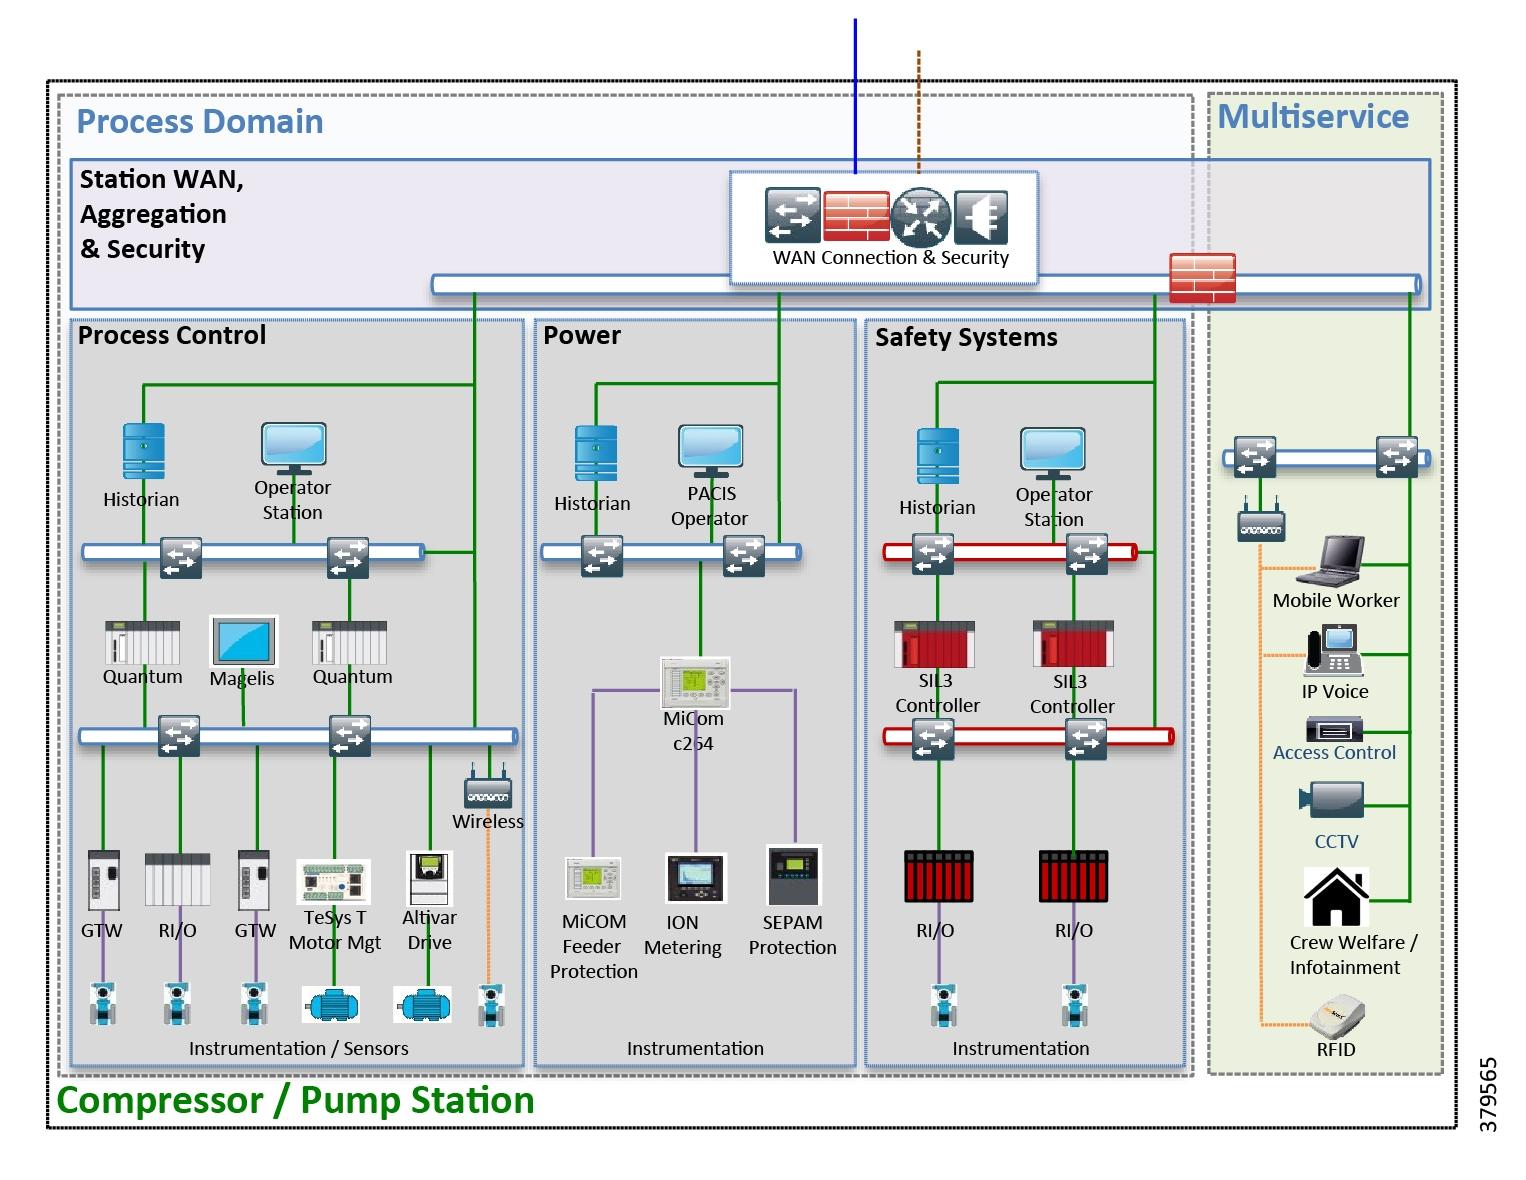 Card Reader Wiring Diagram Moreover Door Access Control Wiring Diagram